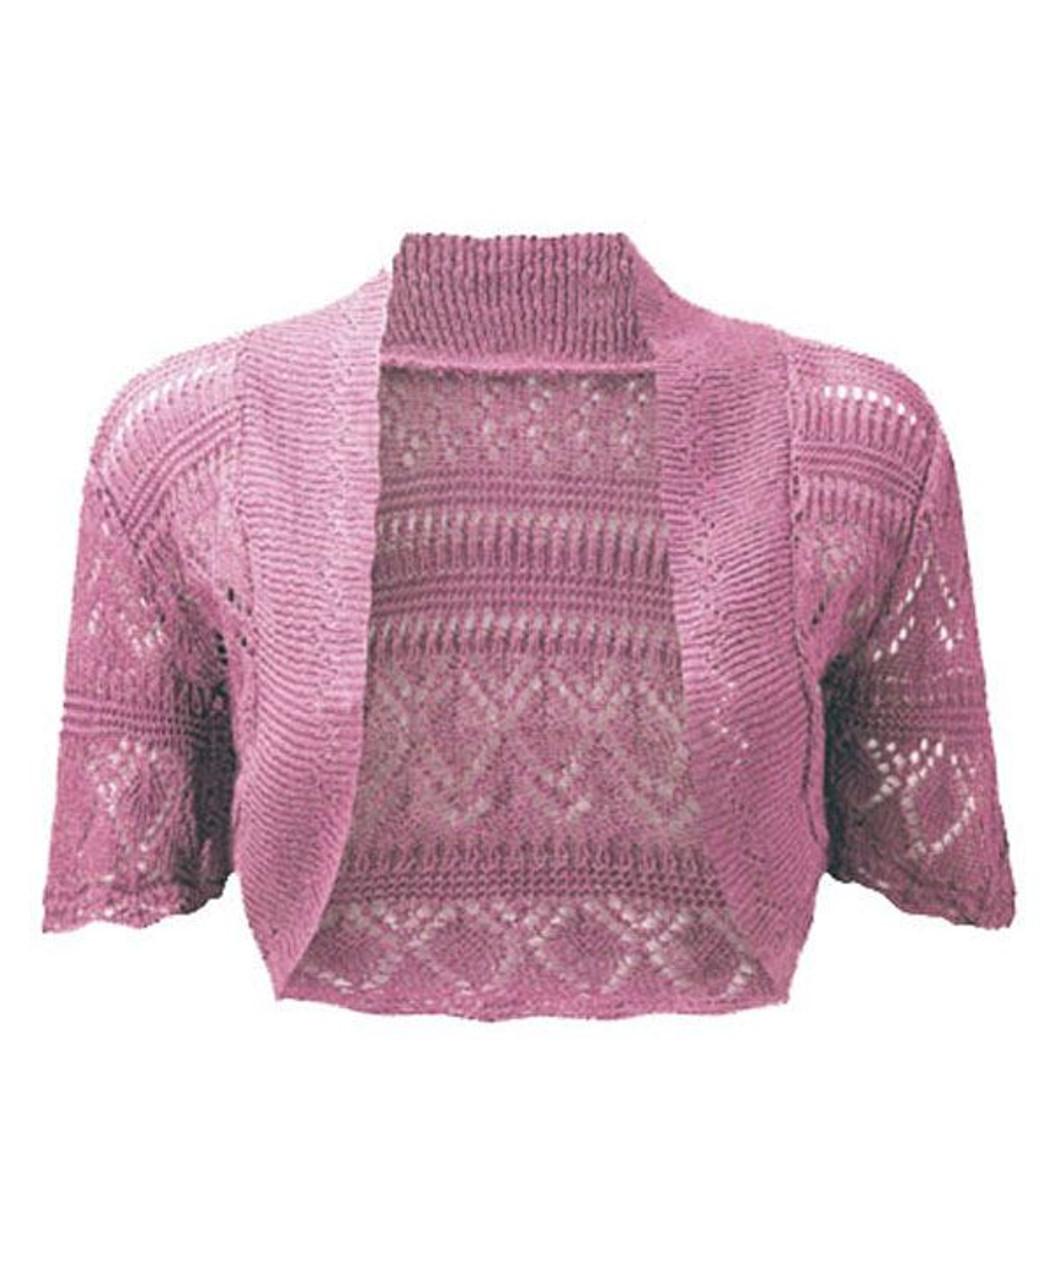 ea76178ba6 Crochet Knitted Bolero Shrug In Pink